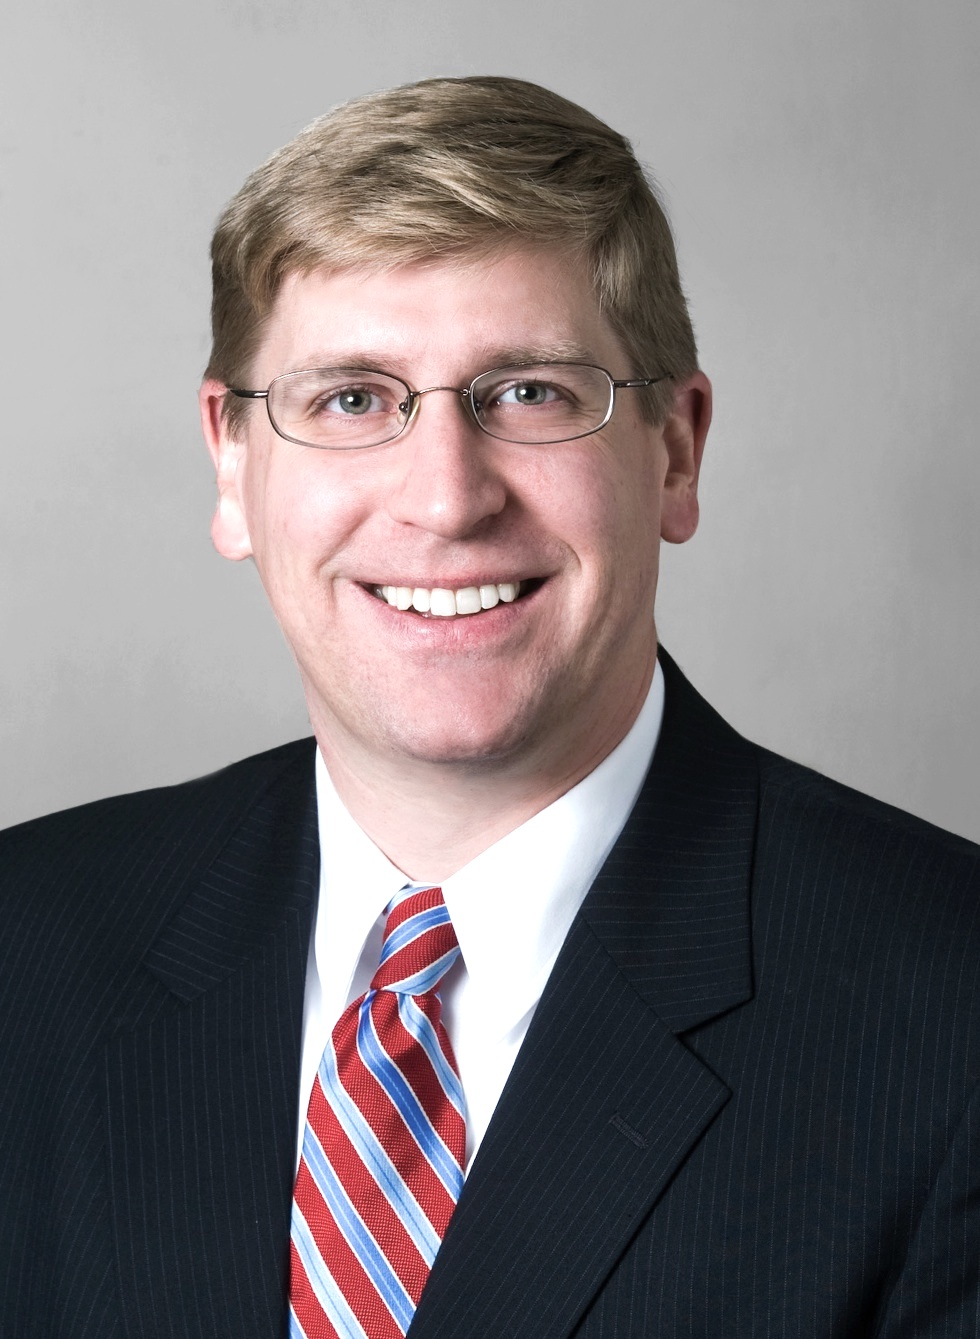 Jonathan M. Hooks